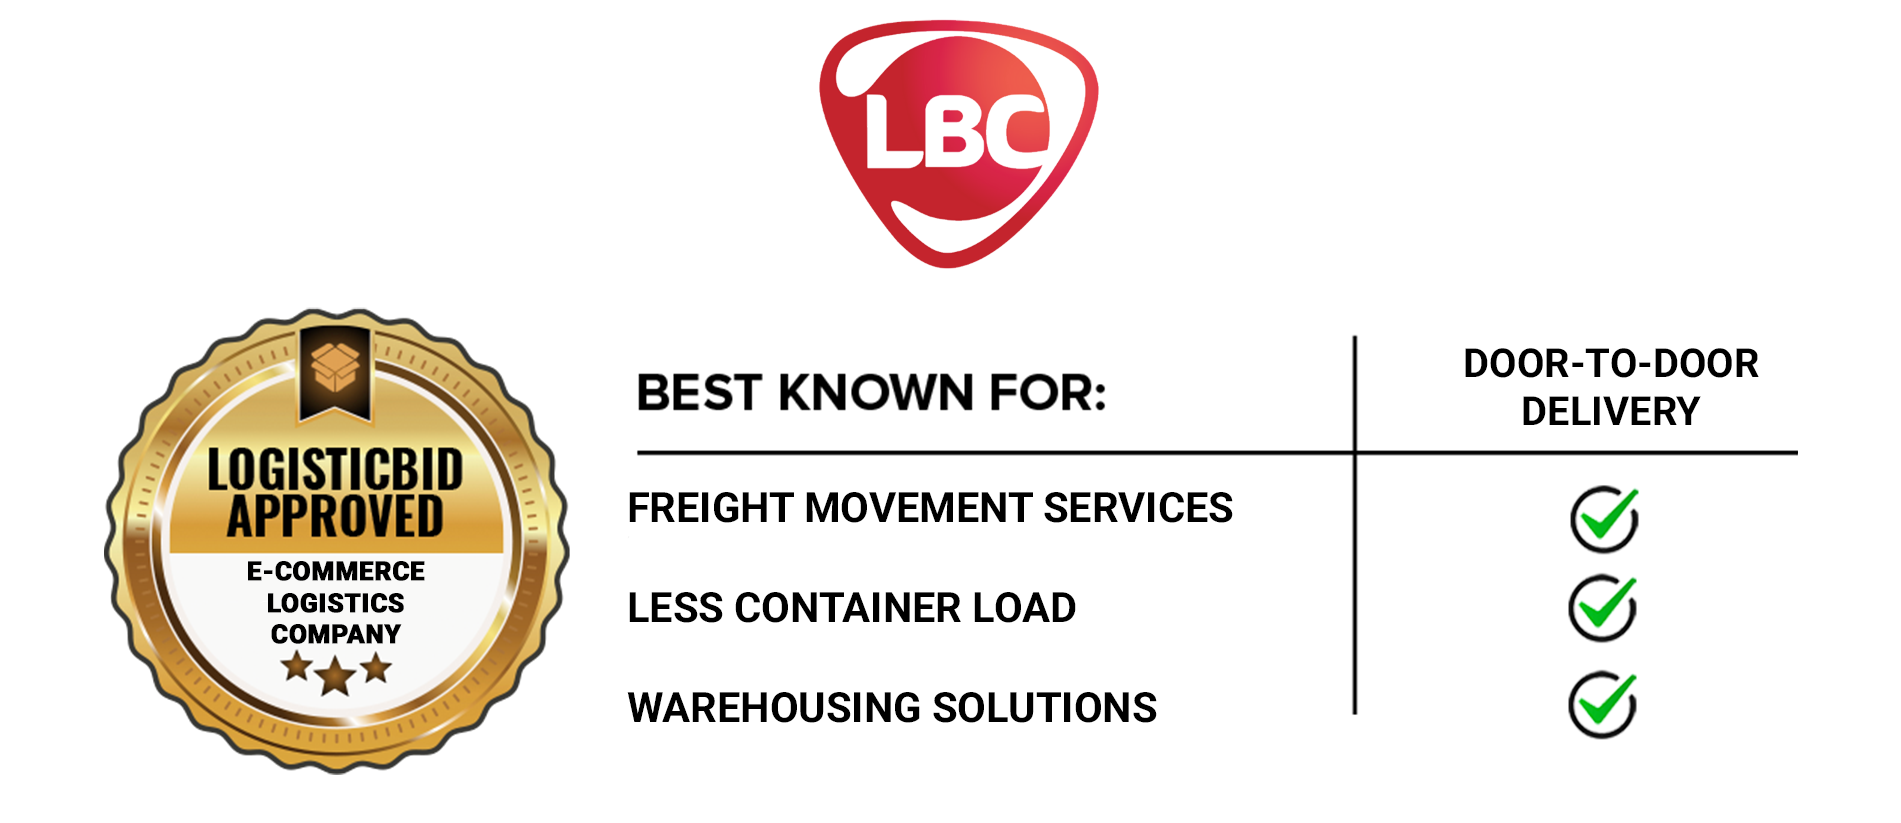 Trucking Services of Leading E-commerce Logistics Company - LBC